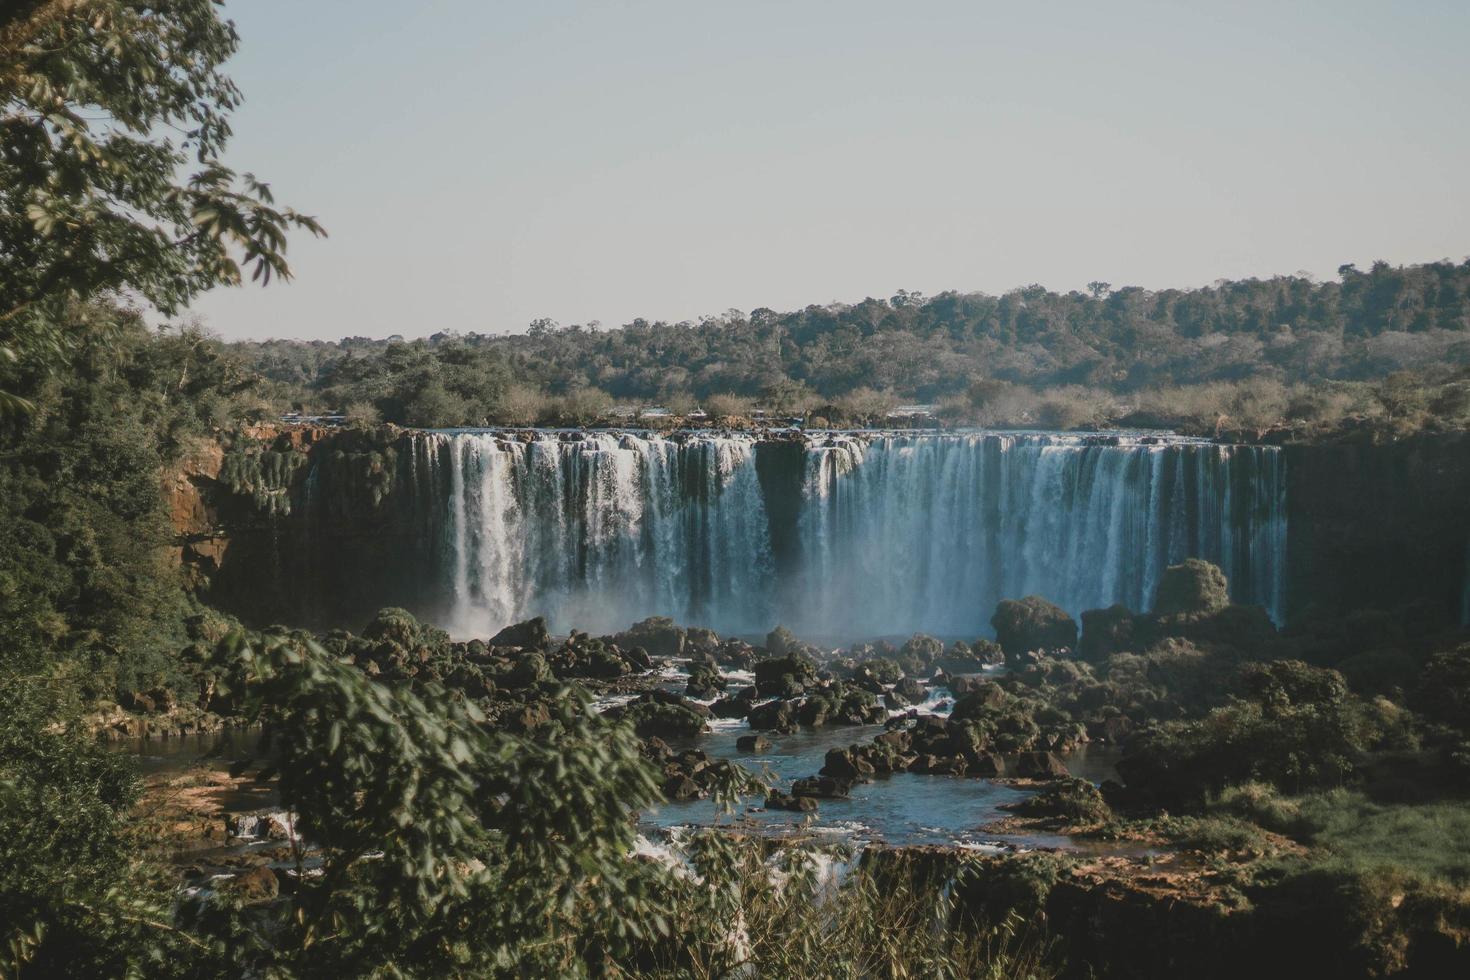 Wide angle photo of waterfall